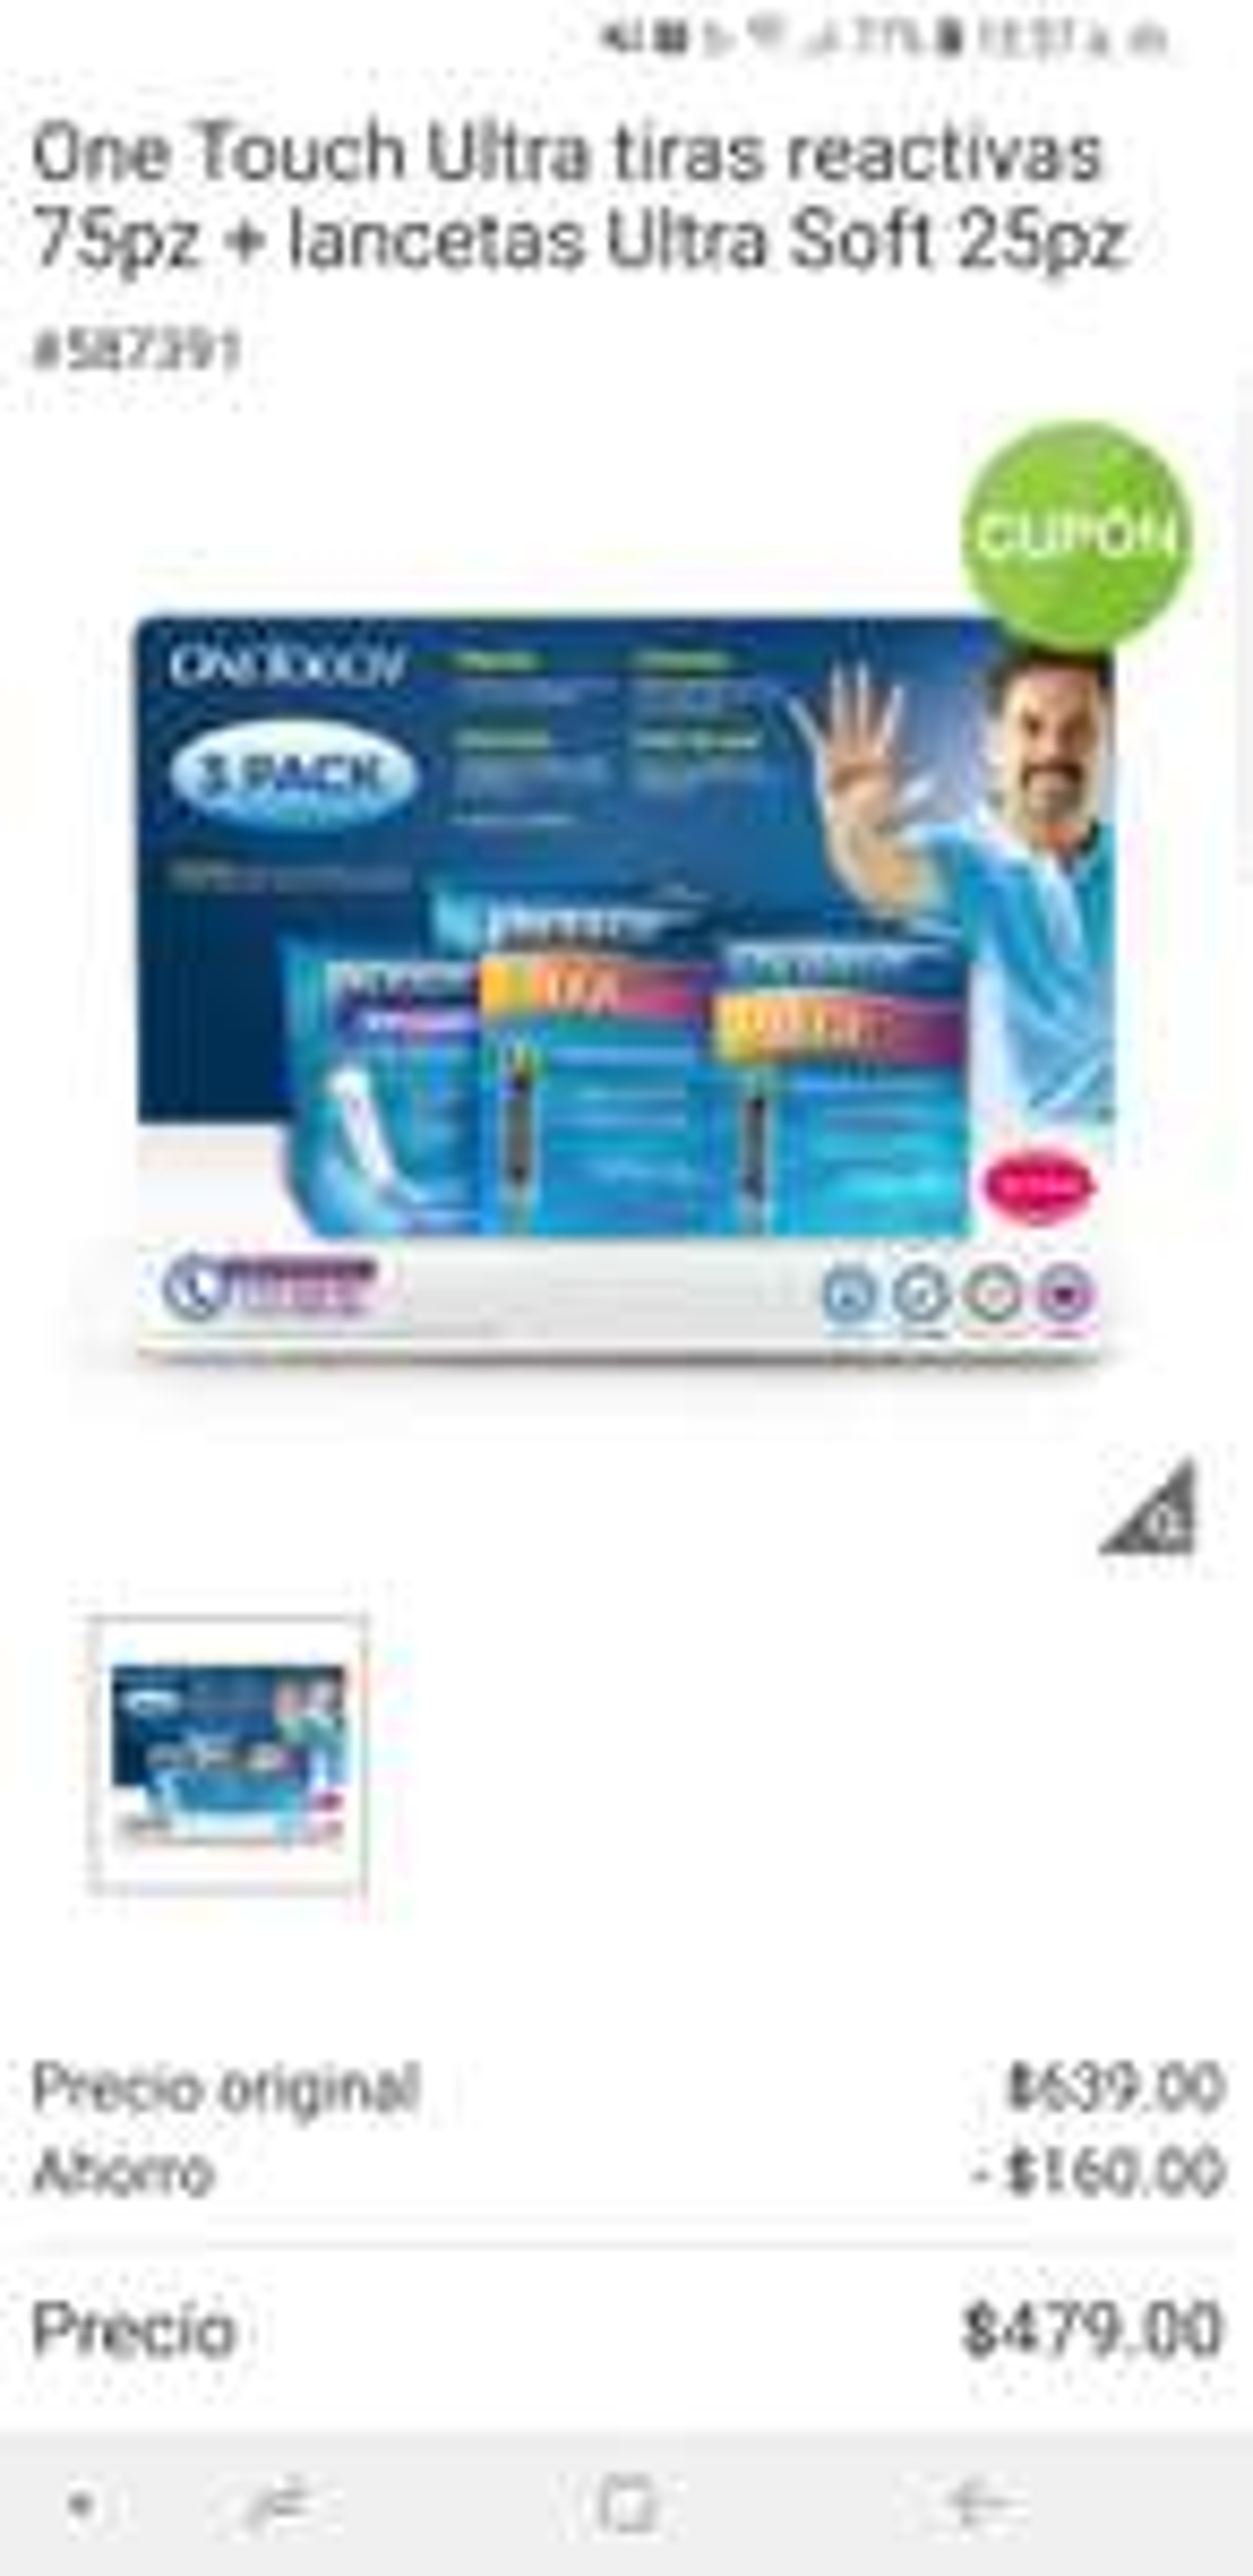 Costco Online: 75 tiras reactivas one touch +25 lancetas por 479 +promotip